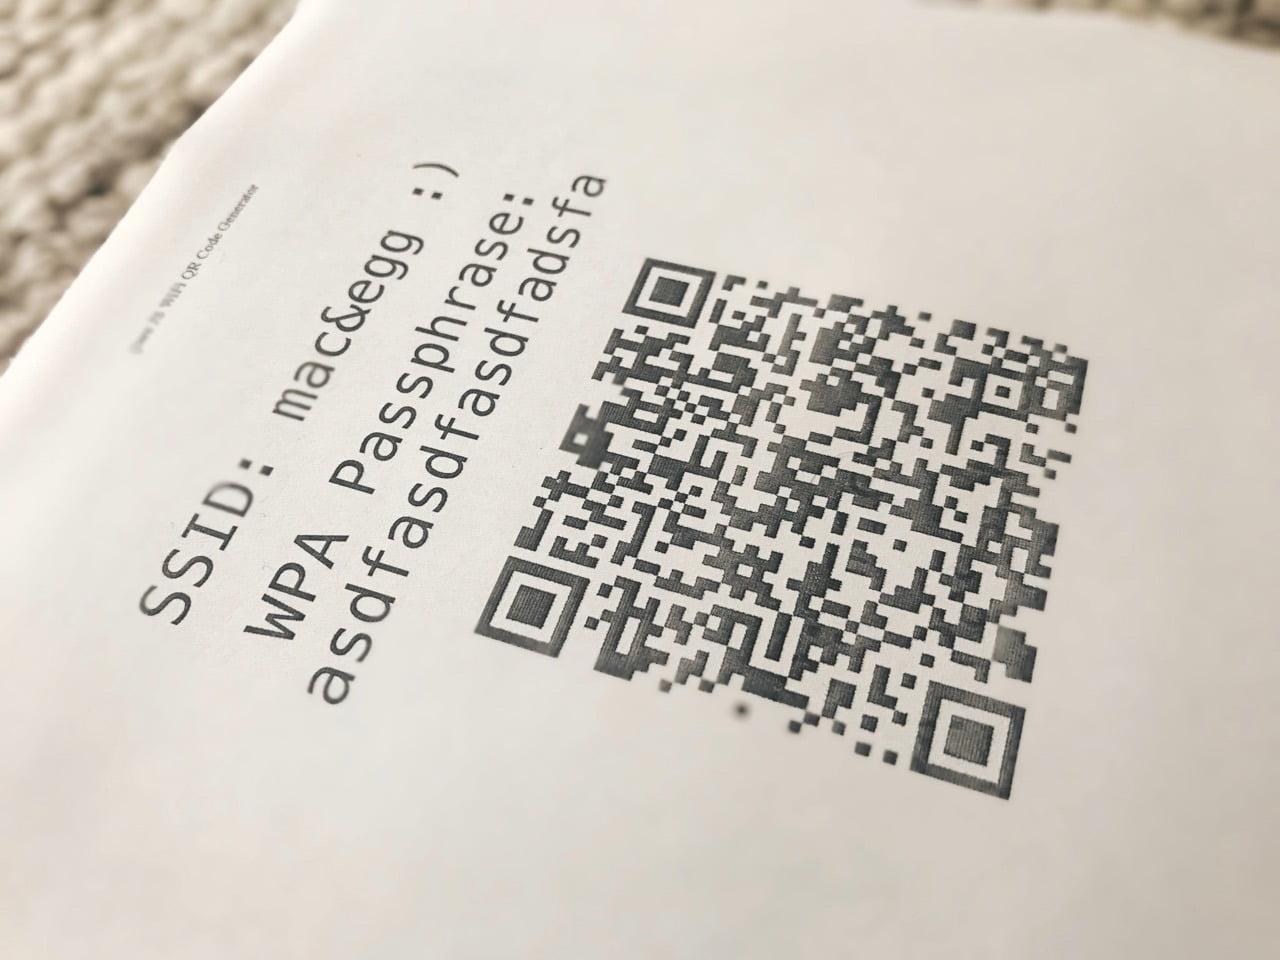 Gäste WLAN Passwort